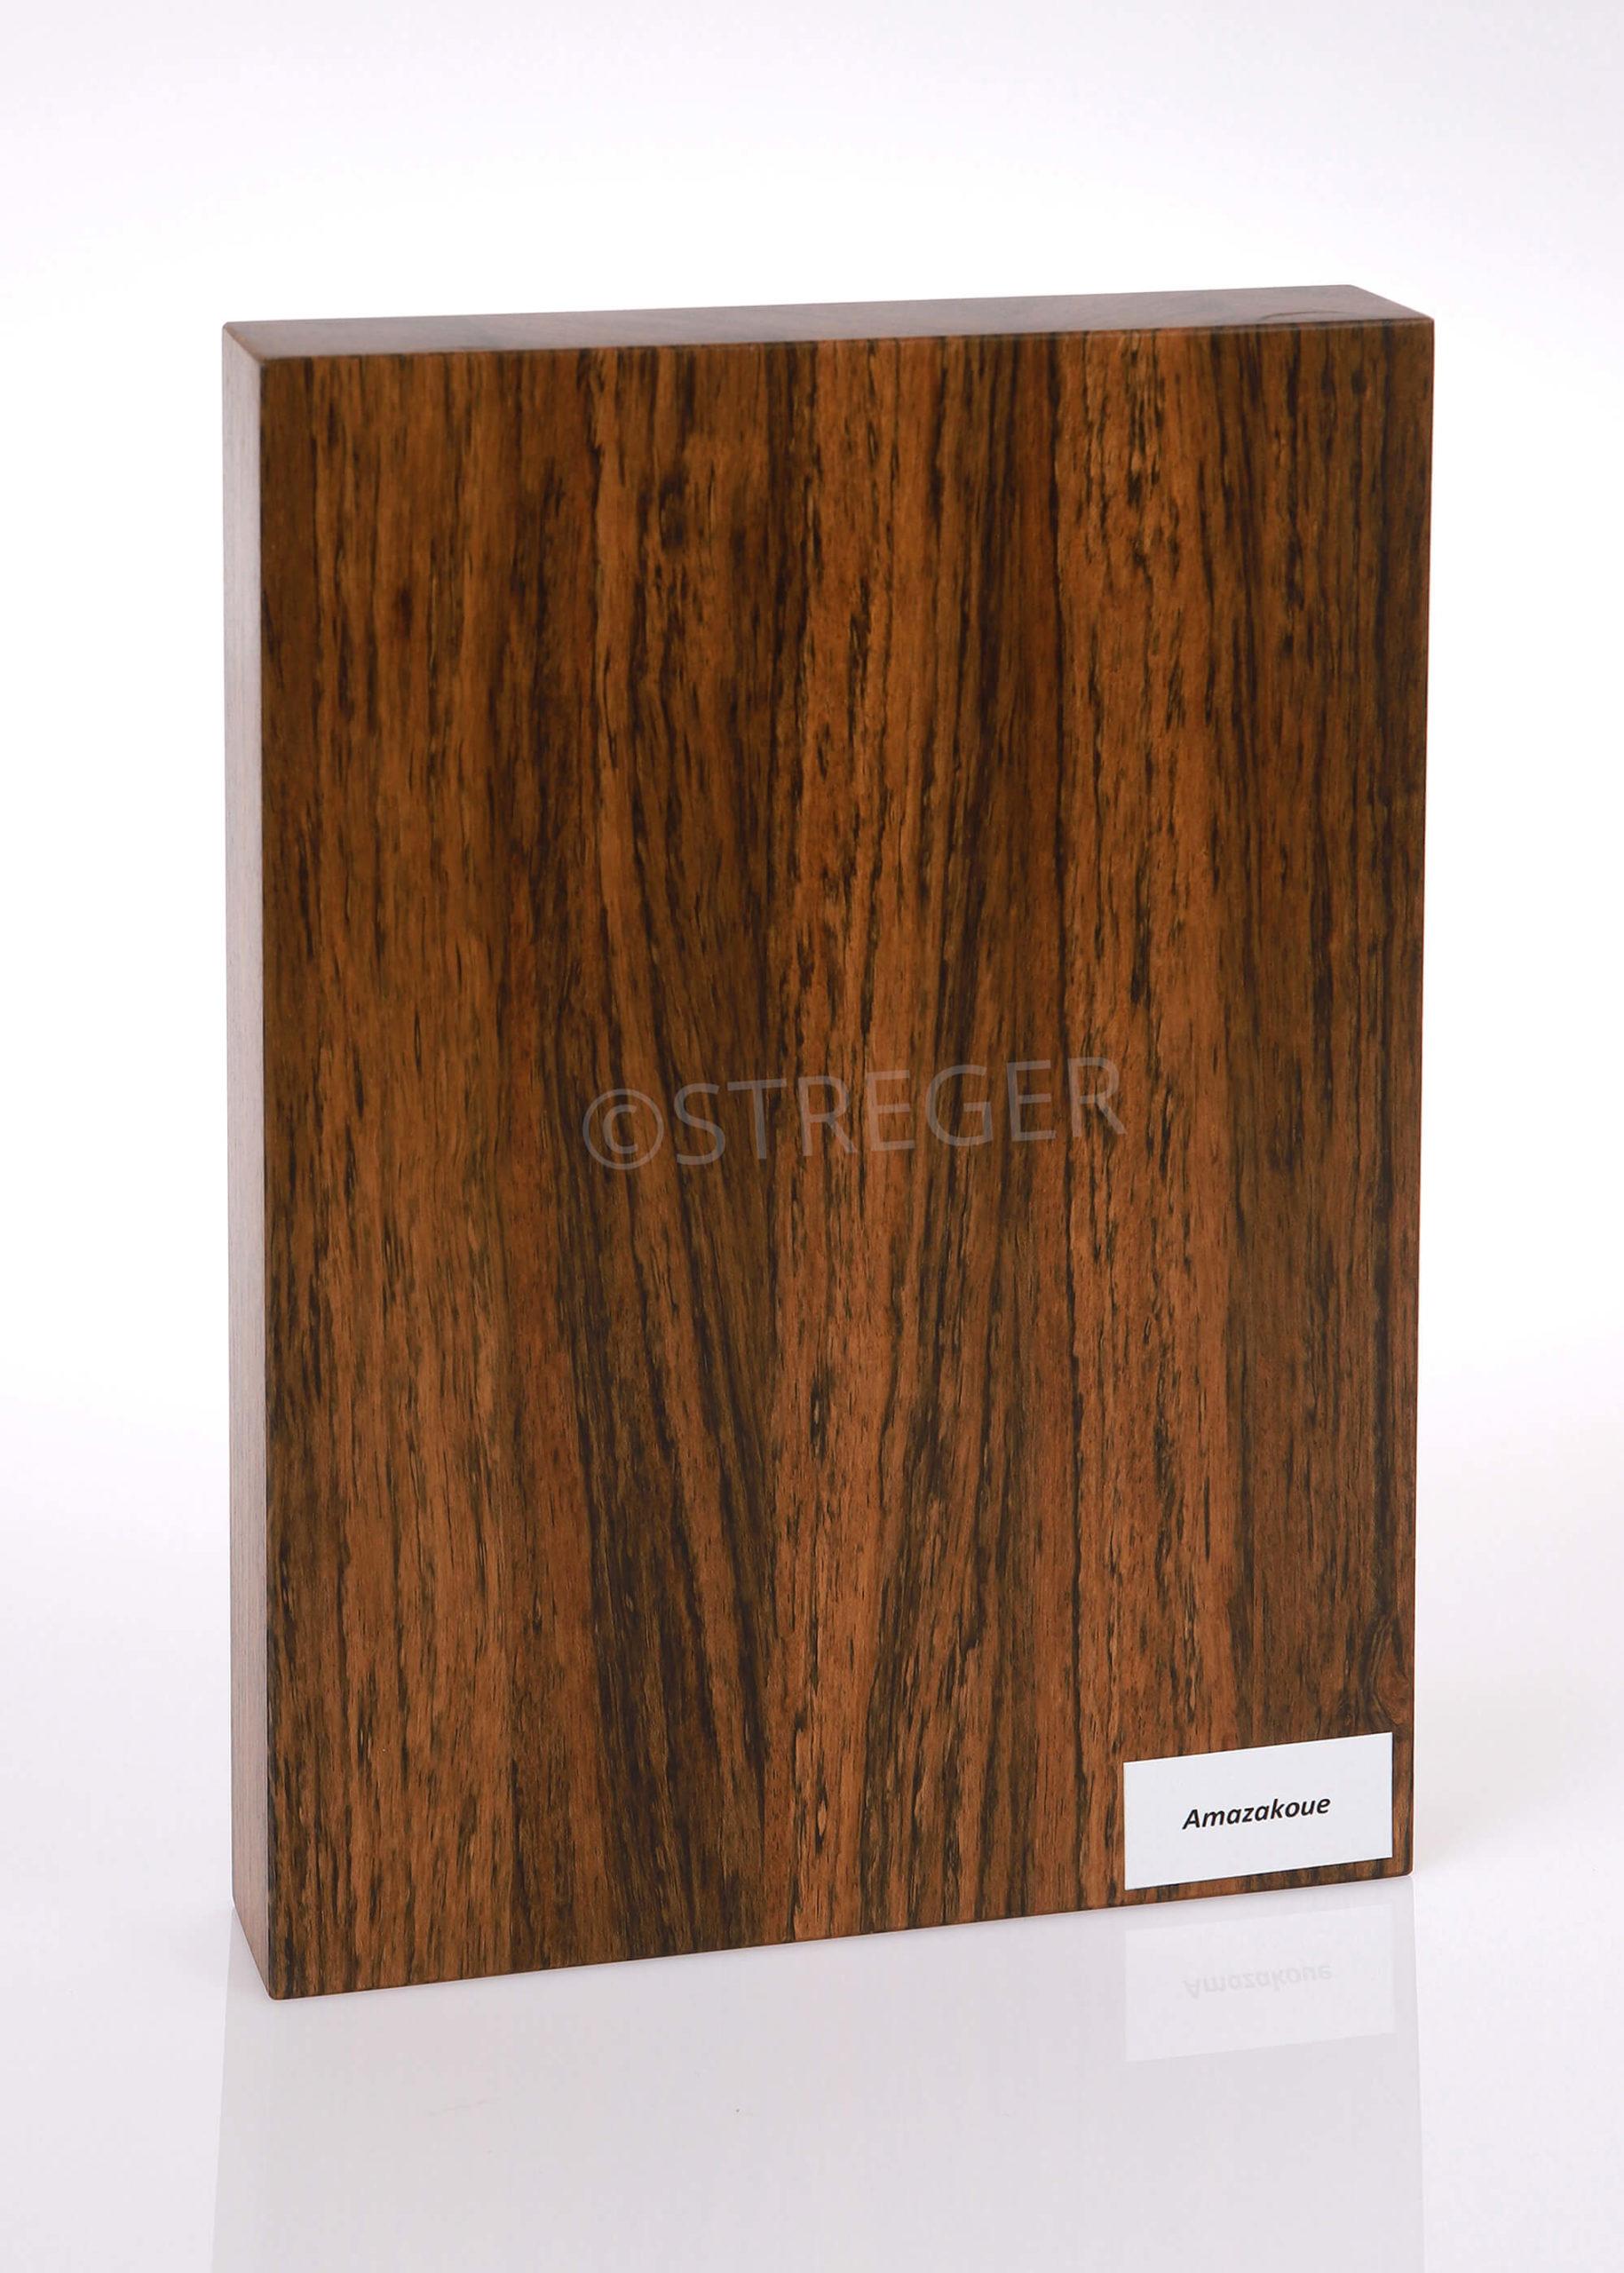 STREGER-Massivholztreppen-Amazokue